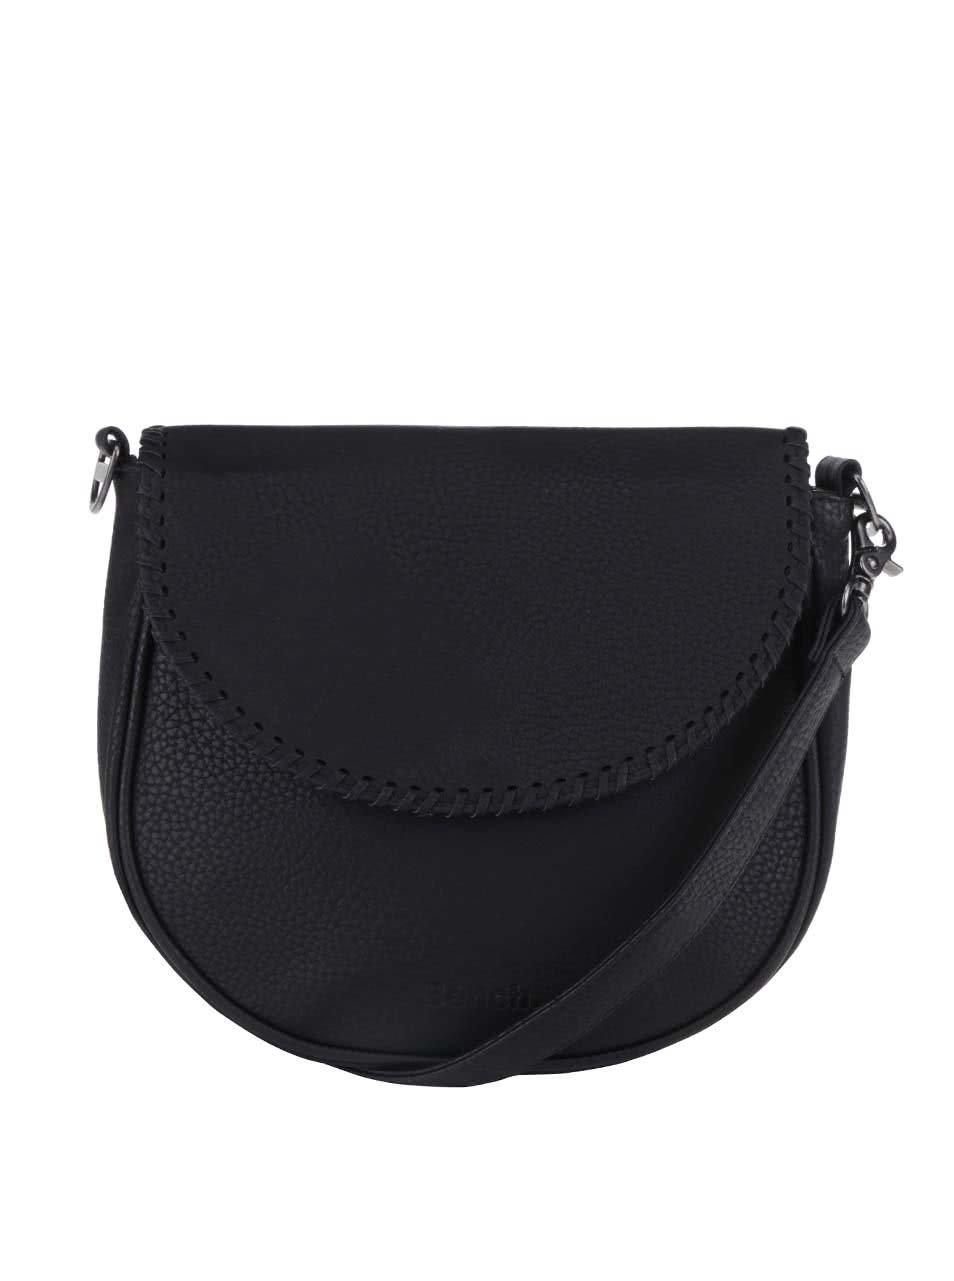 Čierna menšia crossbody kabelka Bench Masterpiece ... b45f89b7d3d